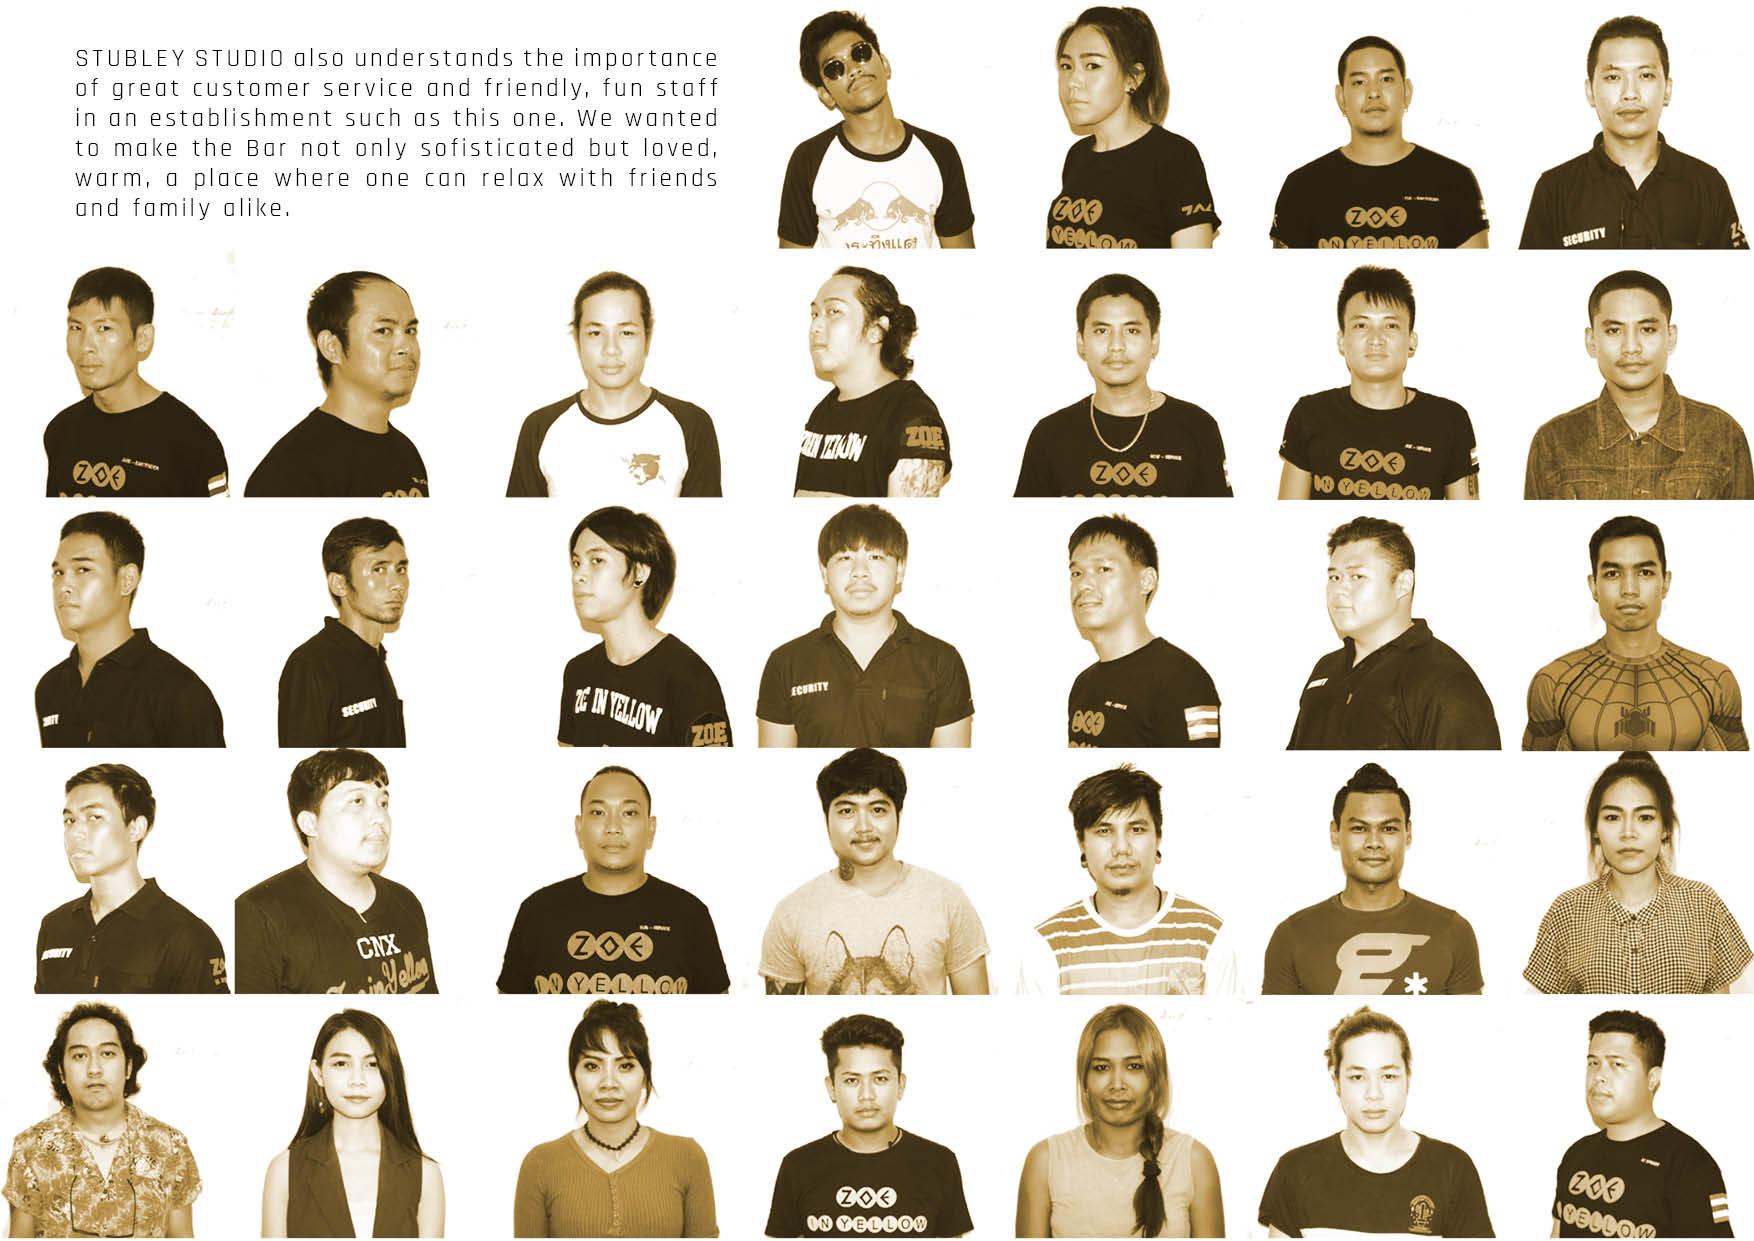 Loosey Goosey Portraits/Chiang Mai/Graphic Design/Stubley Studio